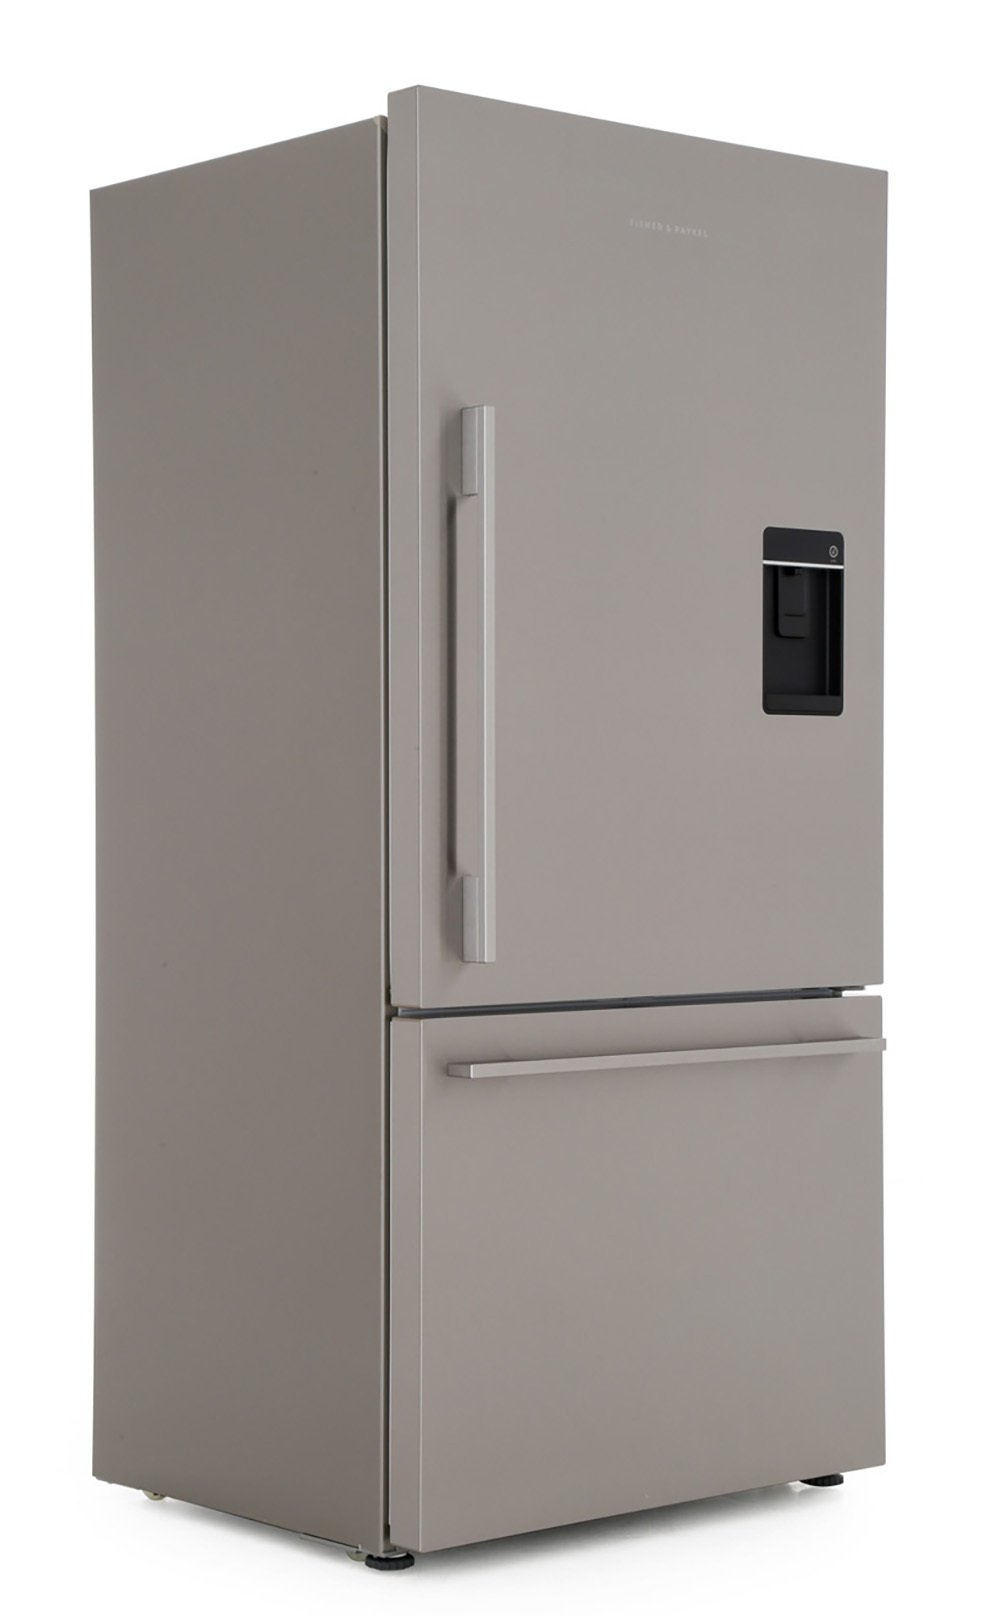 Fisher & Paykel RF522WDRUX4 Frost Free Fridge Freezer